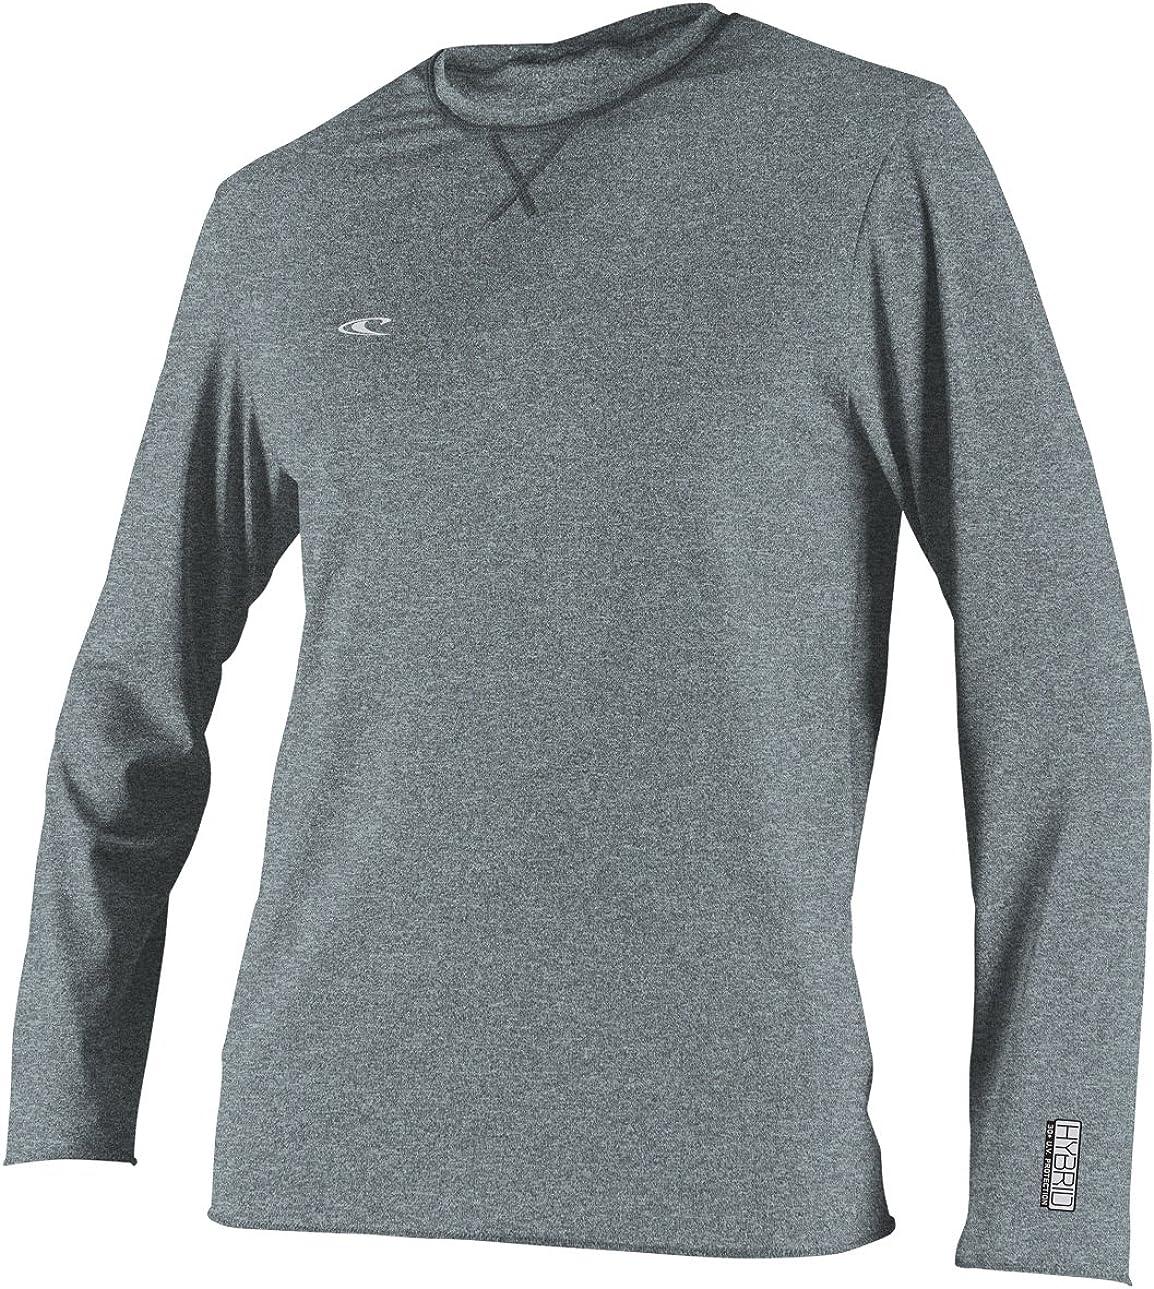 O'Neill  Men's Hybrid UPF 50+ Long Sleeve Sun Shirt: Clothing